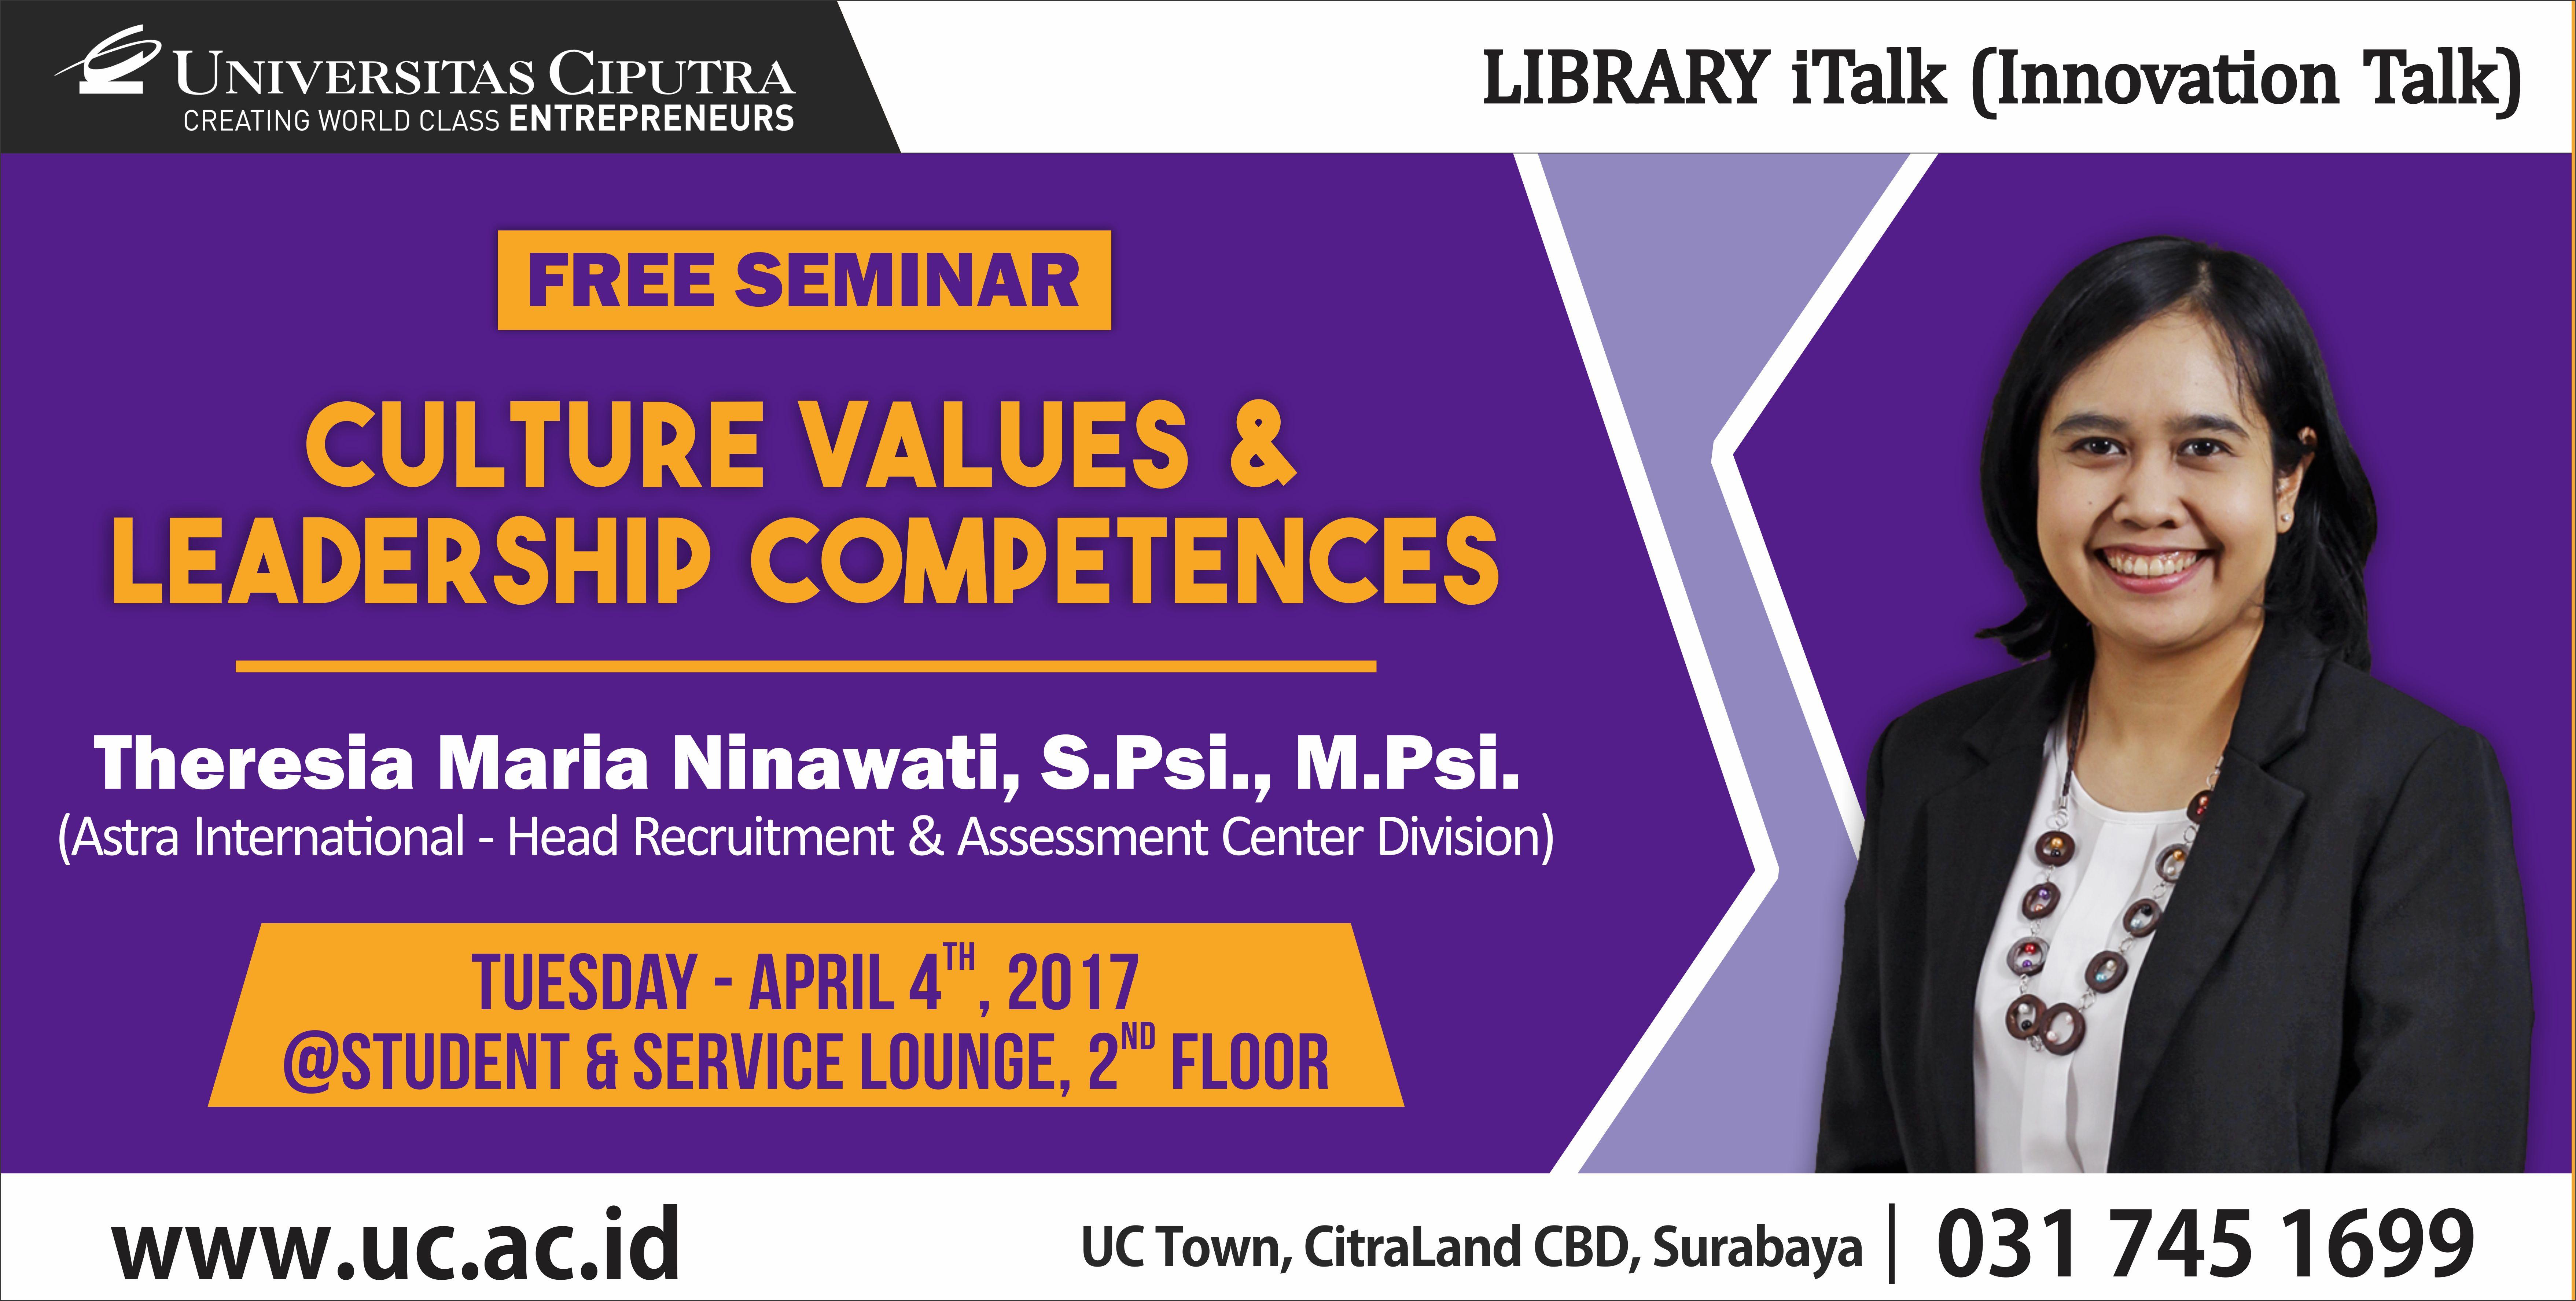 Seminar Culture Values & Leadership Competences